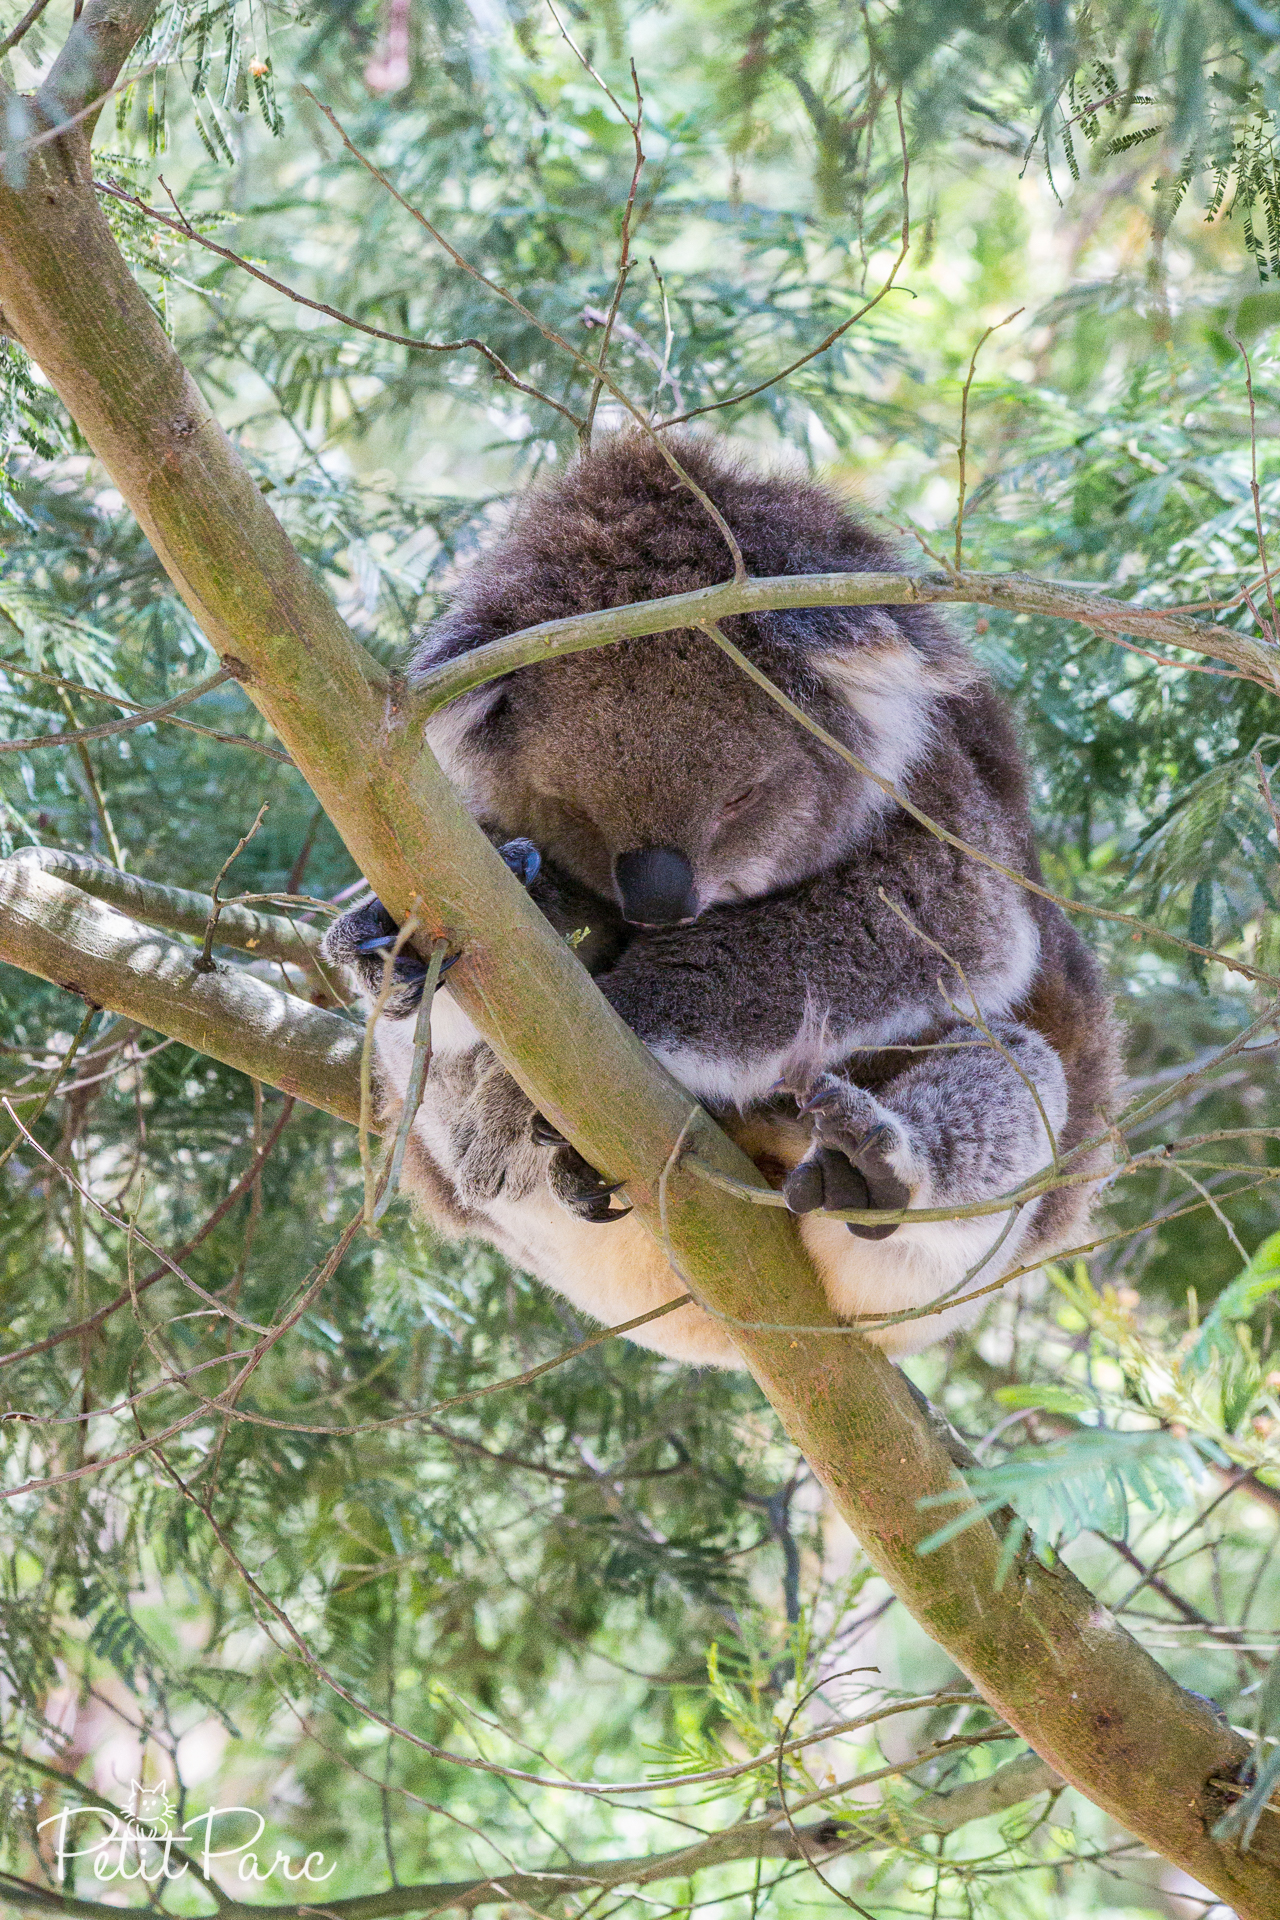 Koala Conservation Center